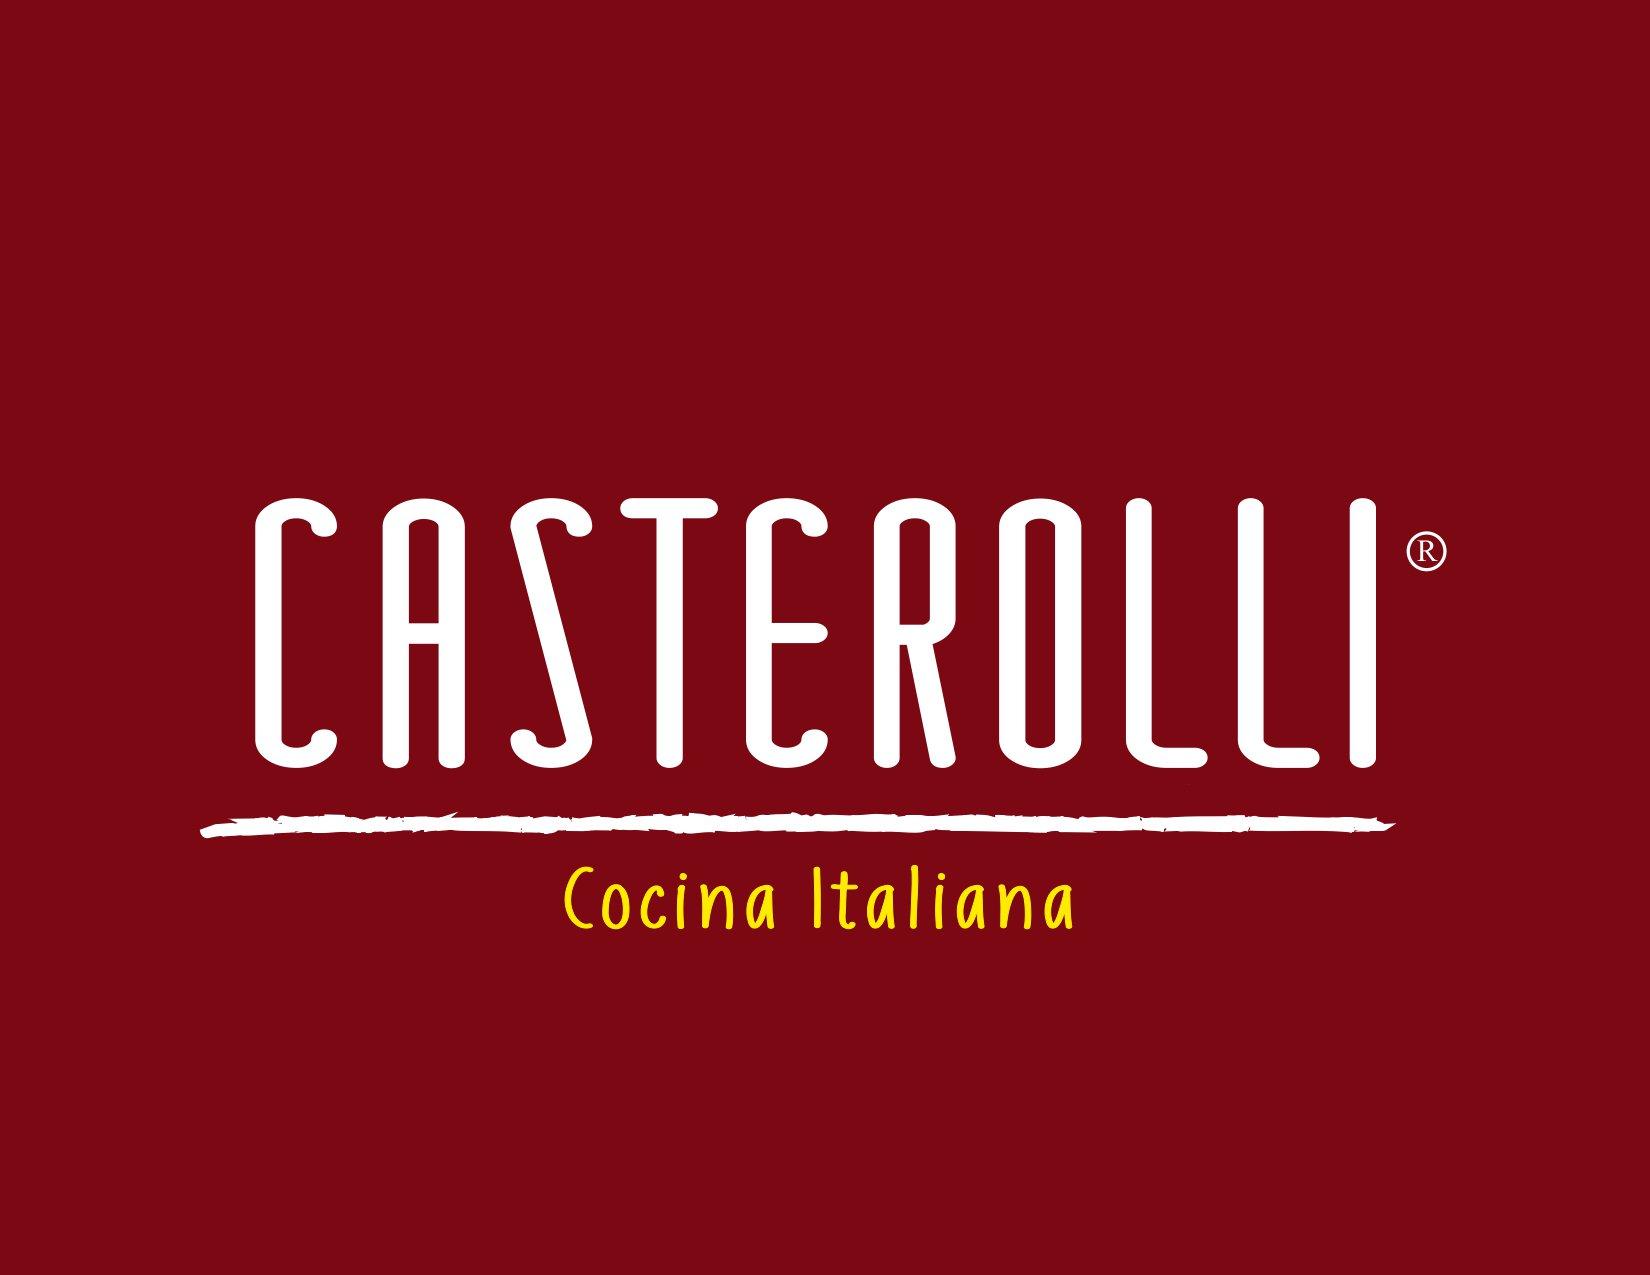 Casterolli Cocina Italiana